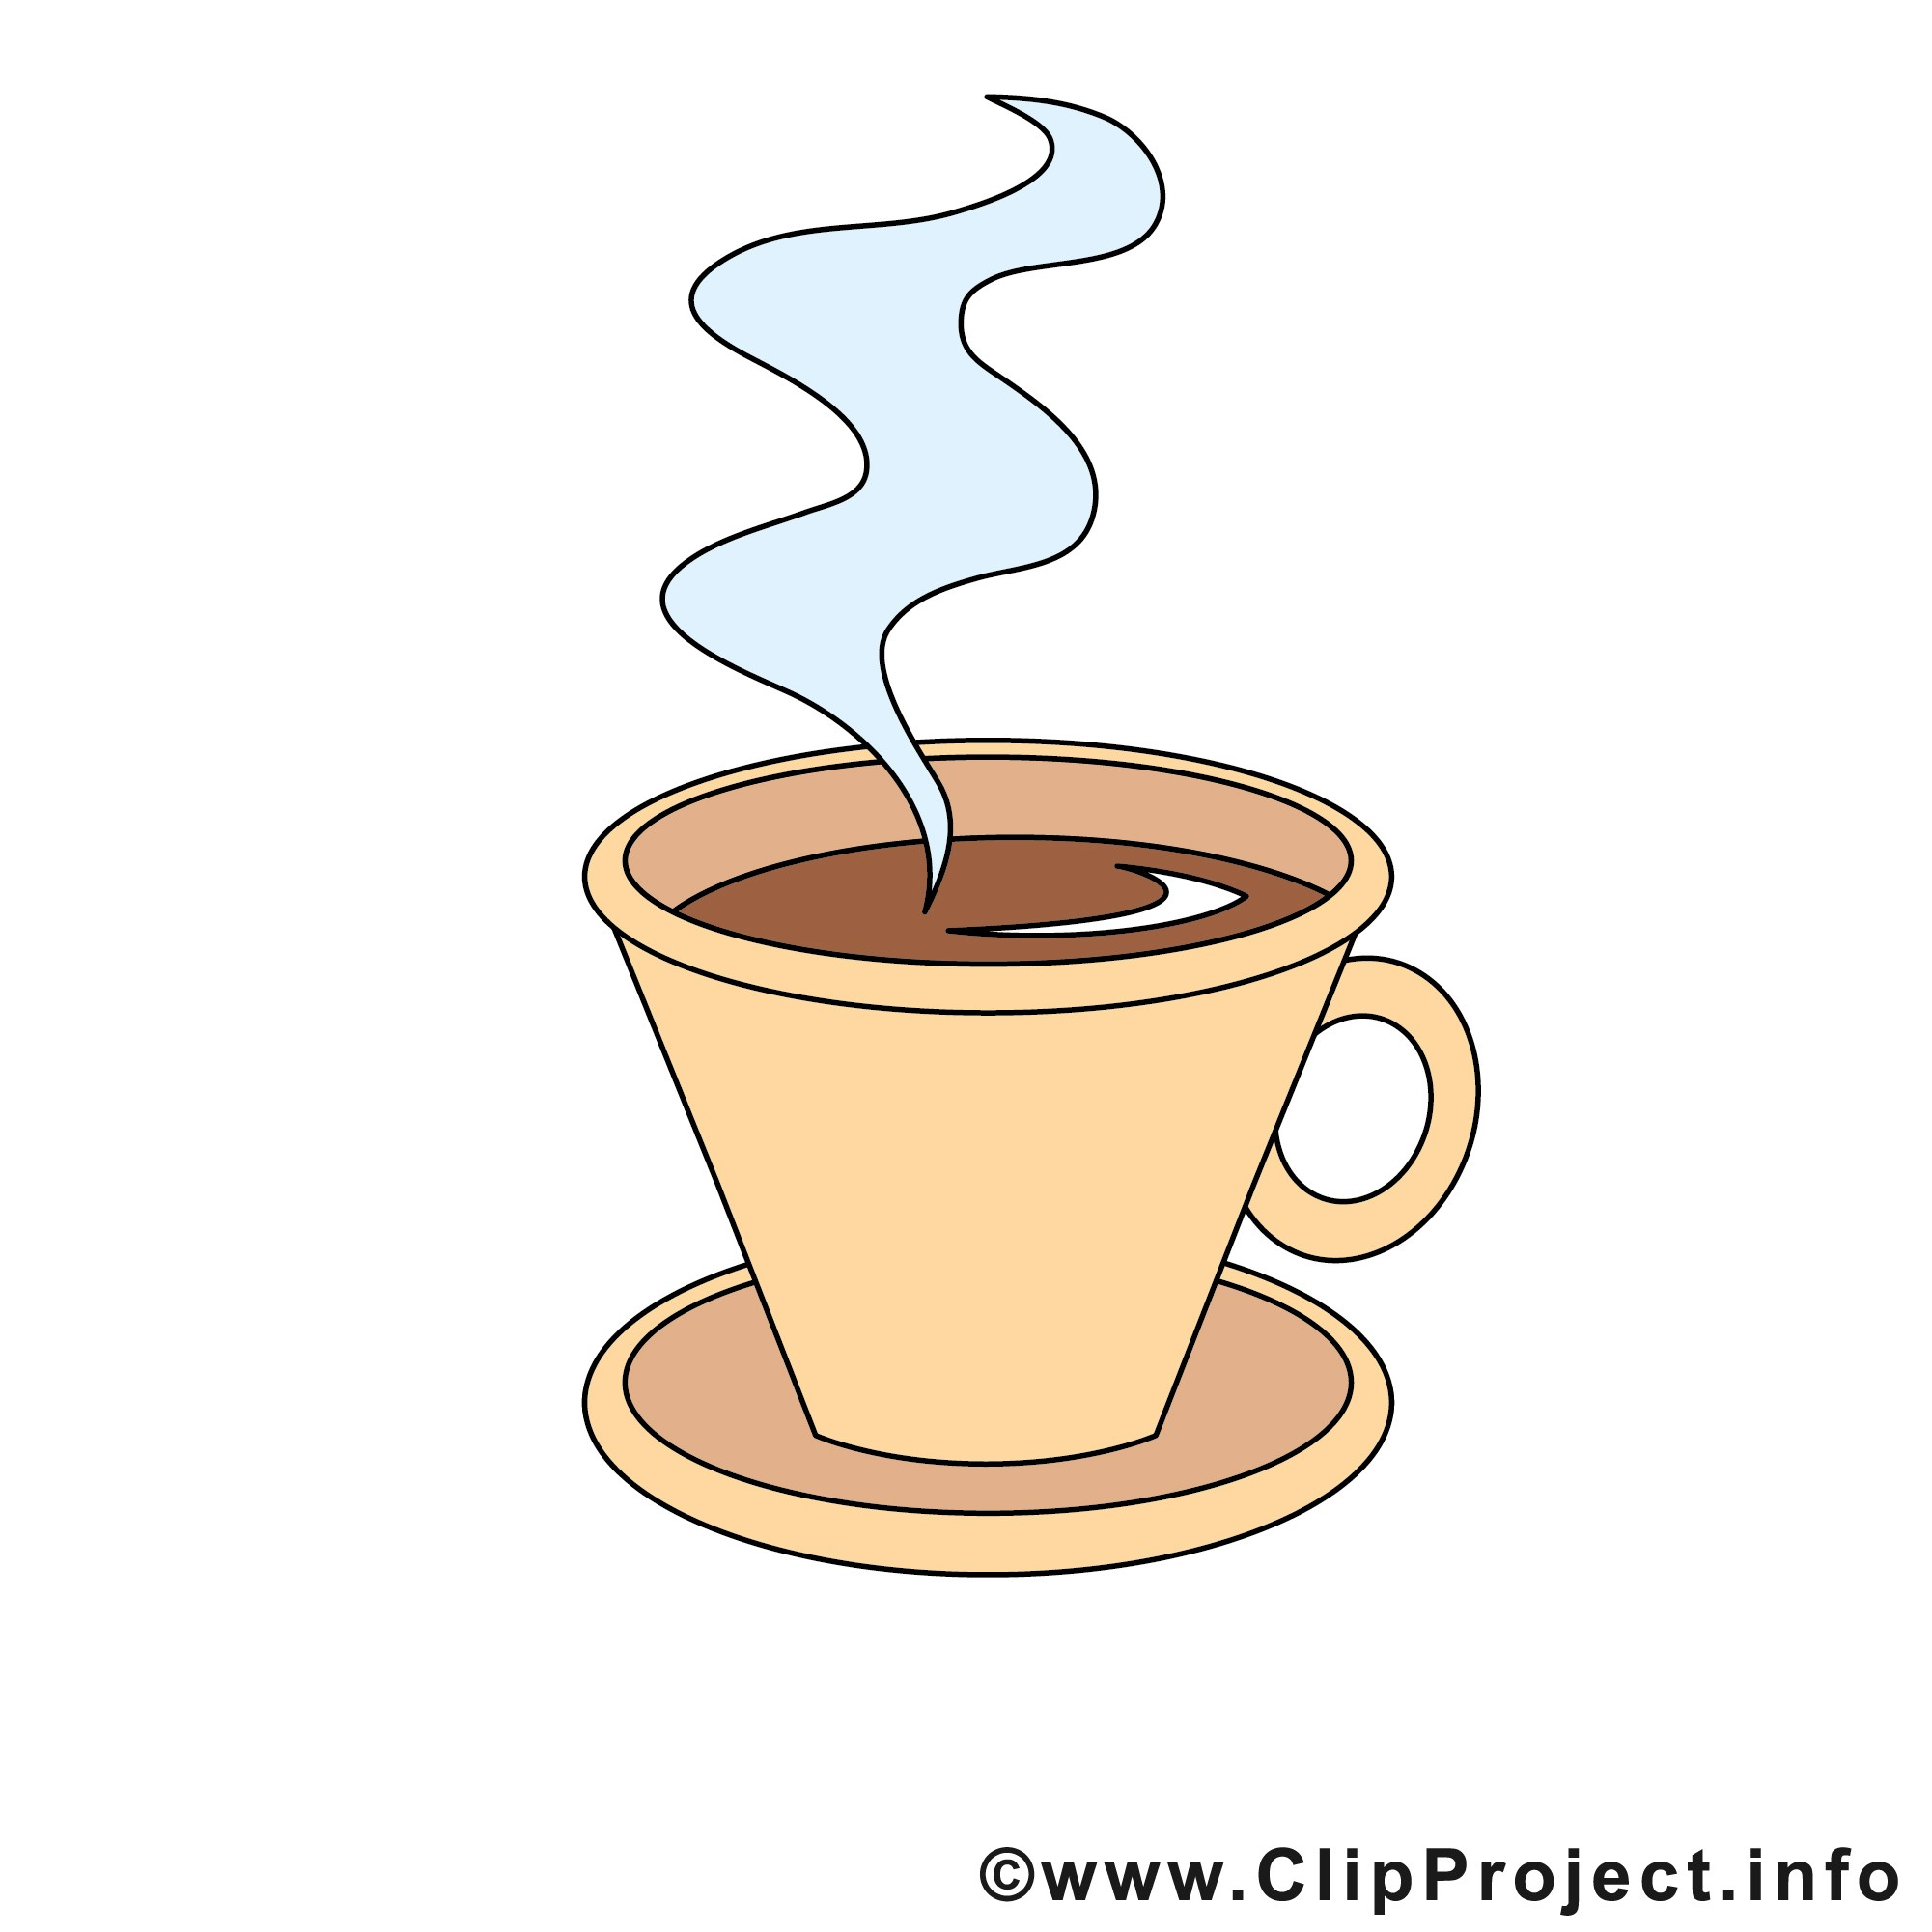 Kaffee clipart kostenlos 1 » Clipart Portal.